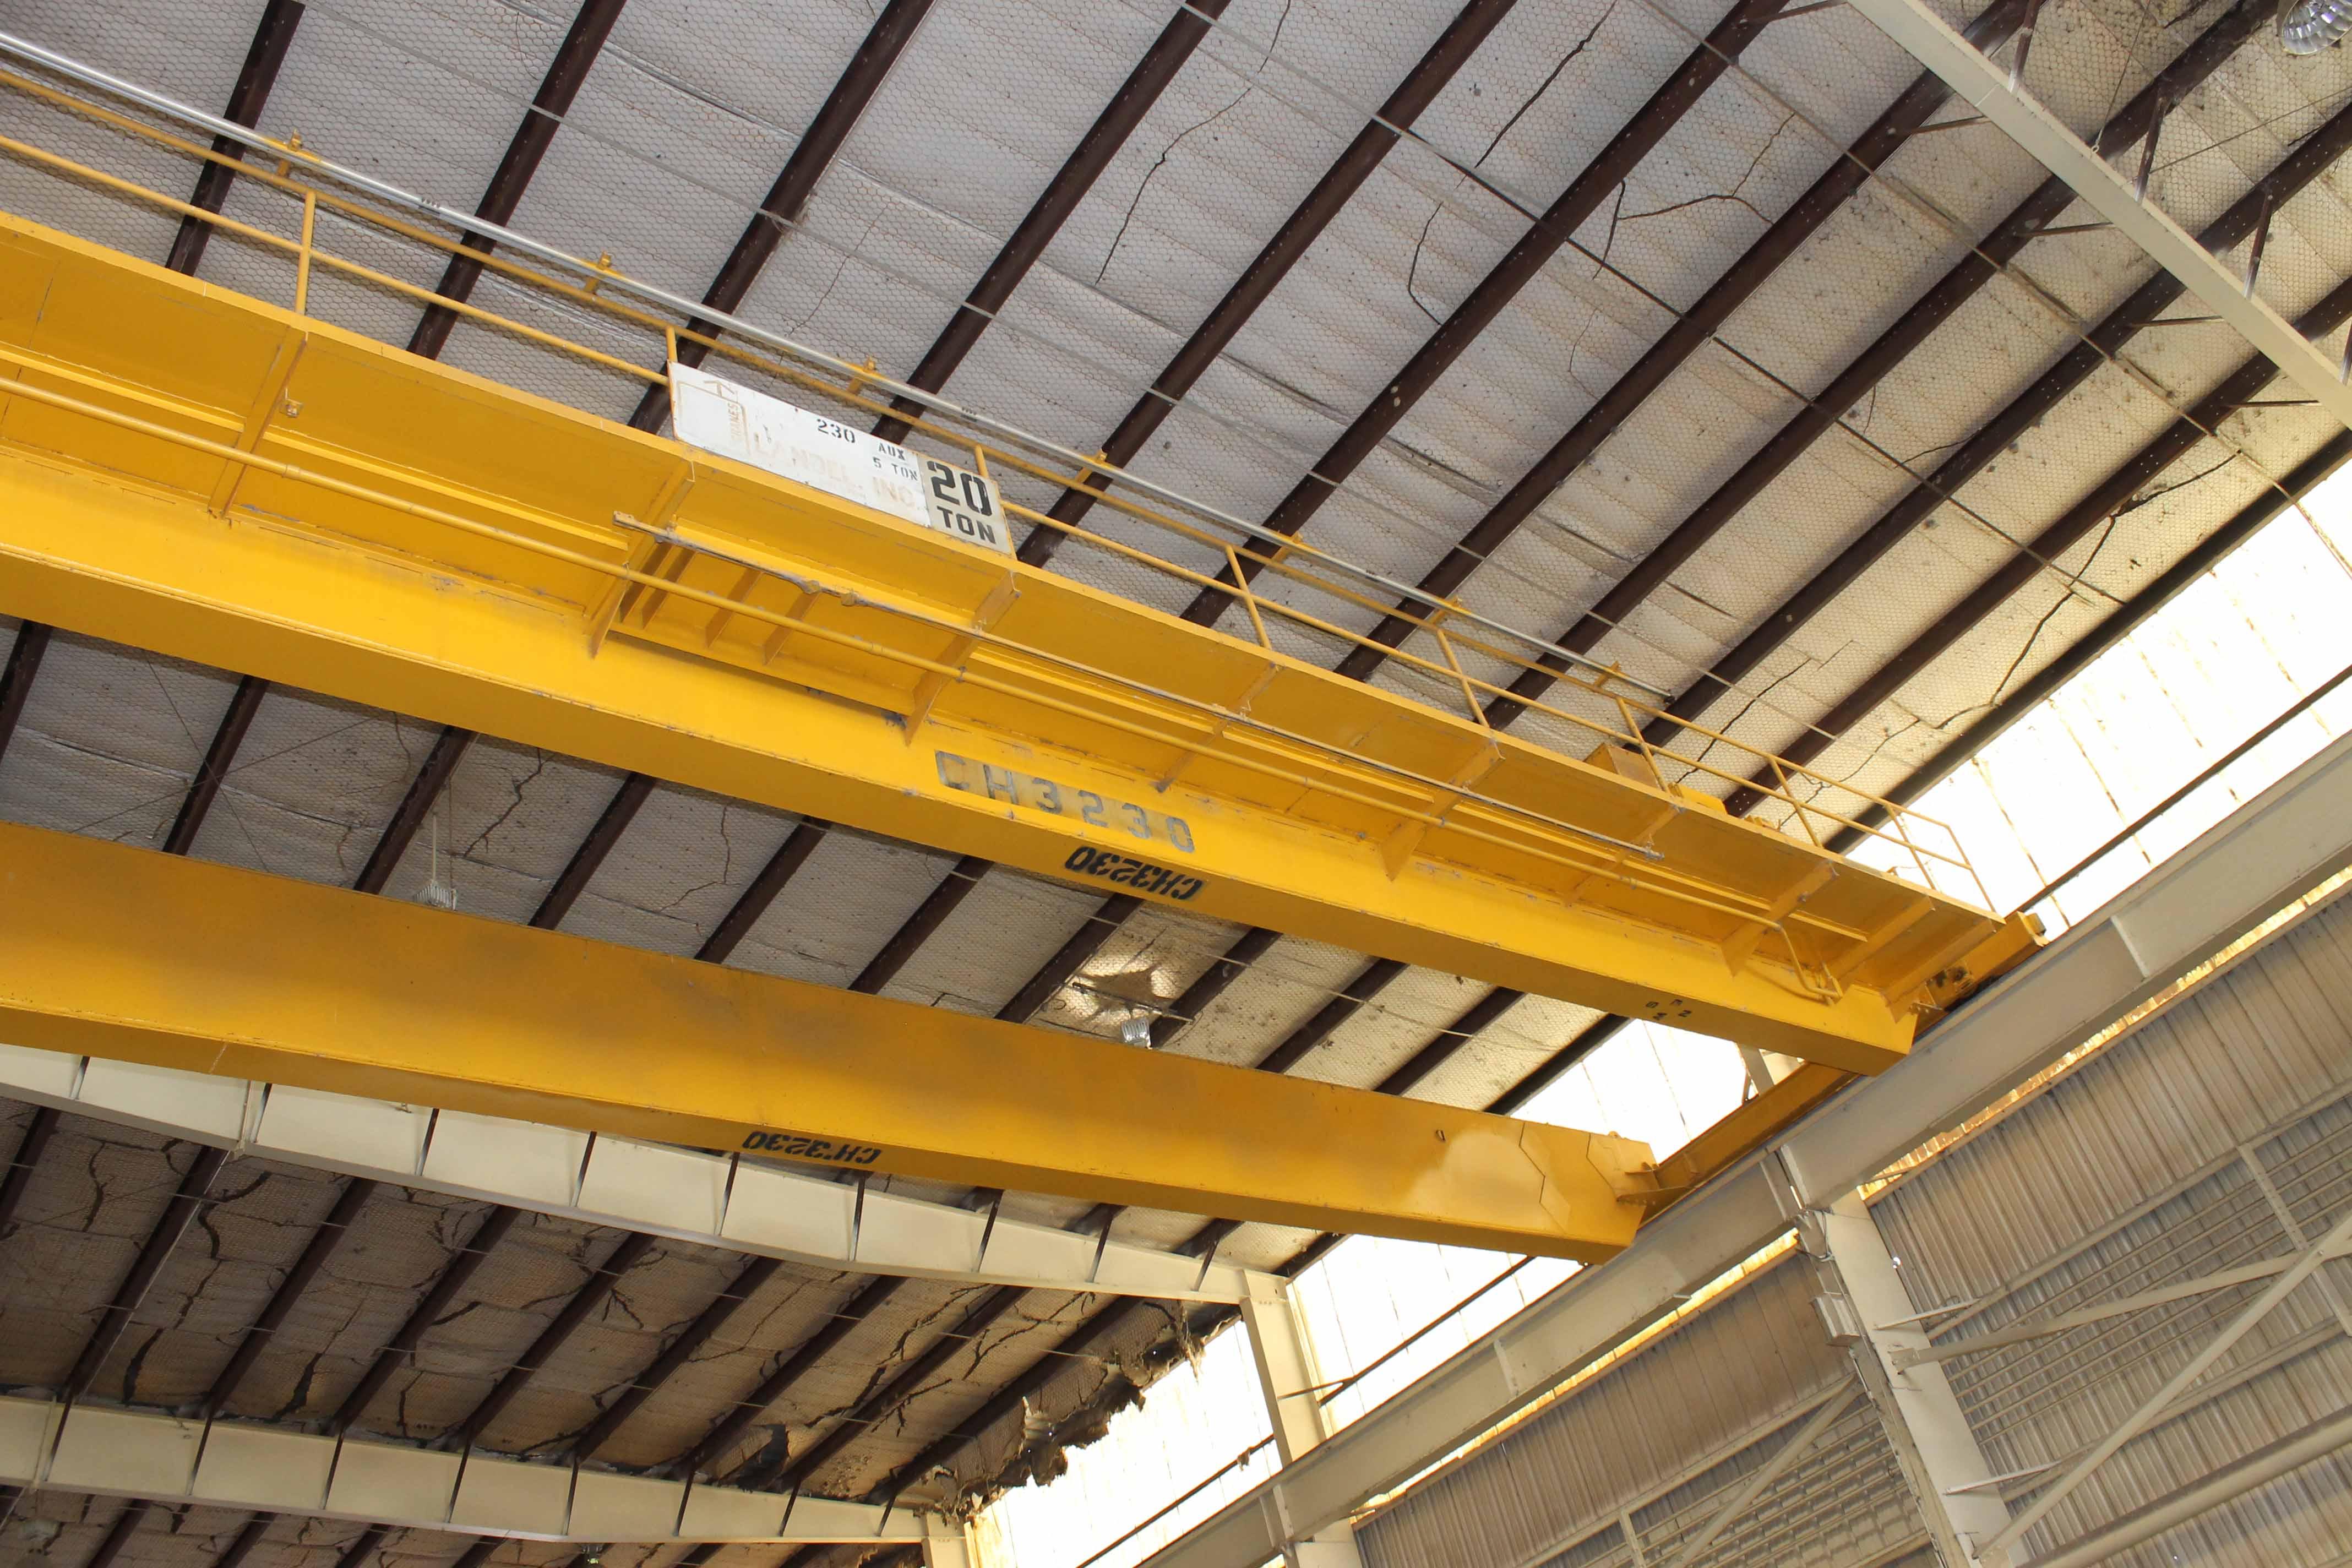 "Lot 13 - Overhead Bridge Crane, Landel 20 ton cap. with 5 ton aux. x 71'4"" span, pendant control, dual box"